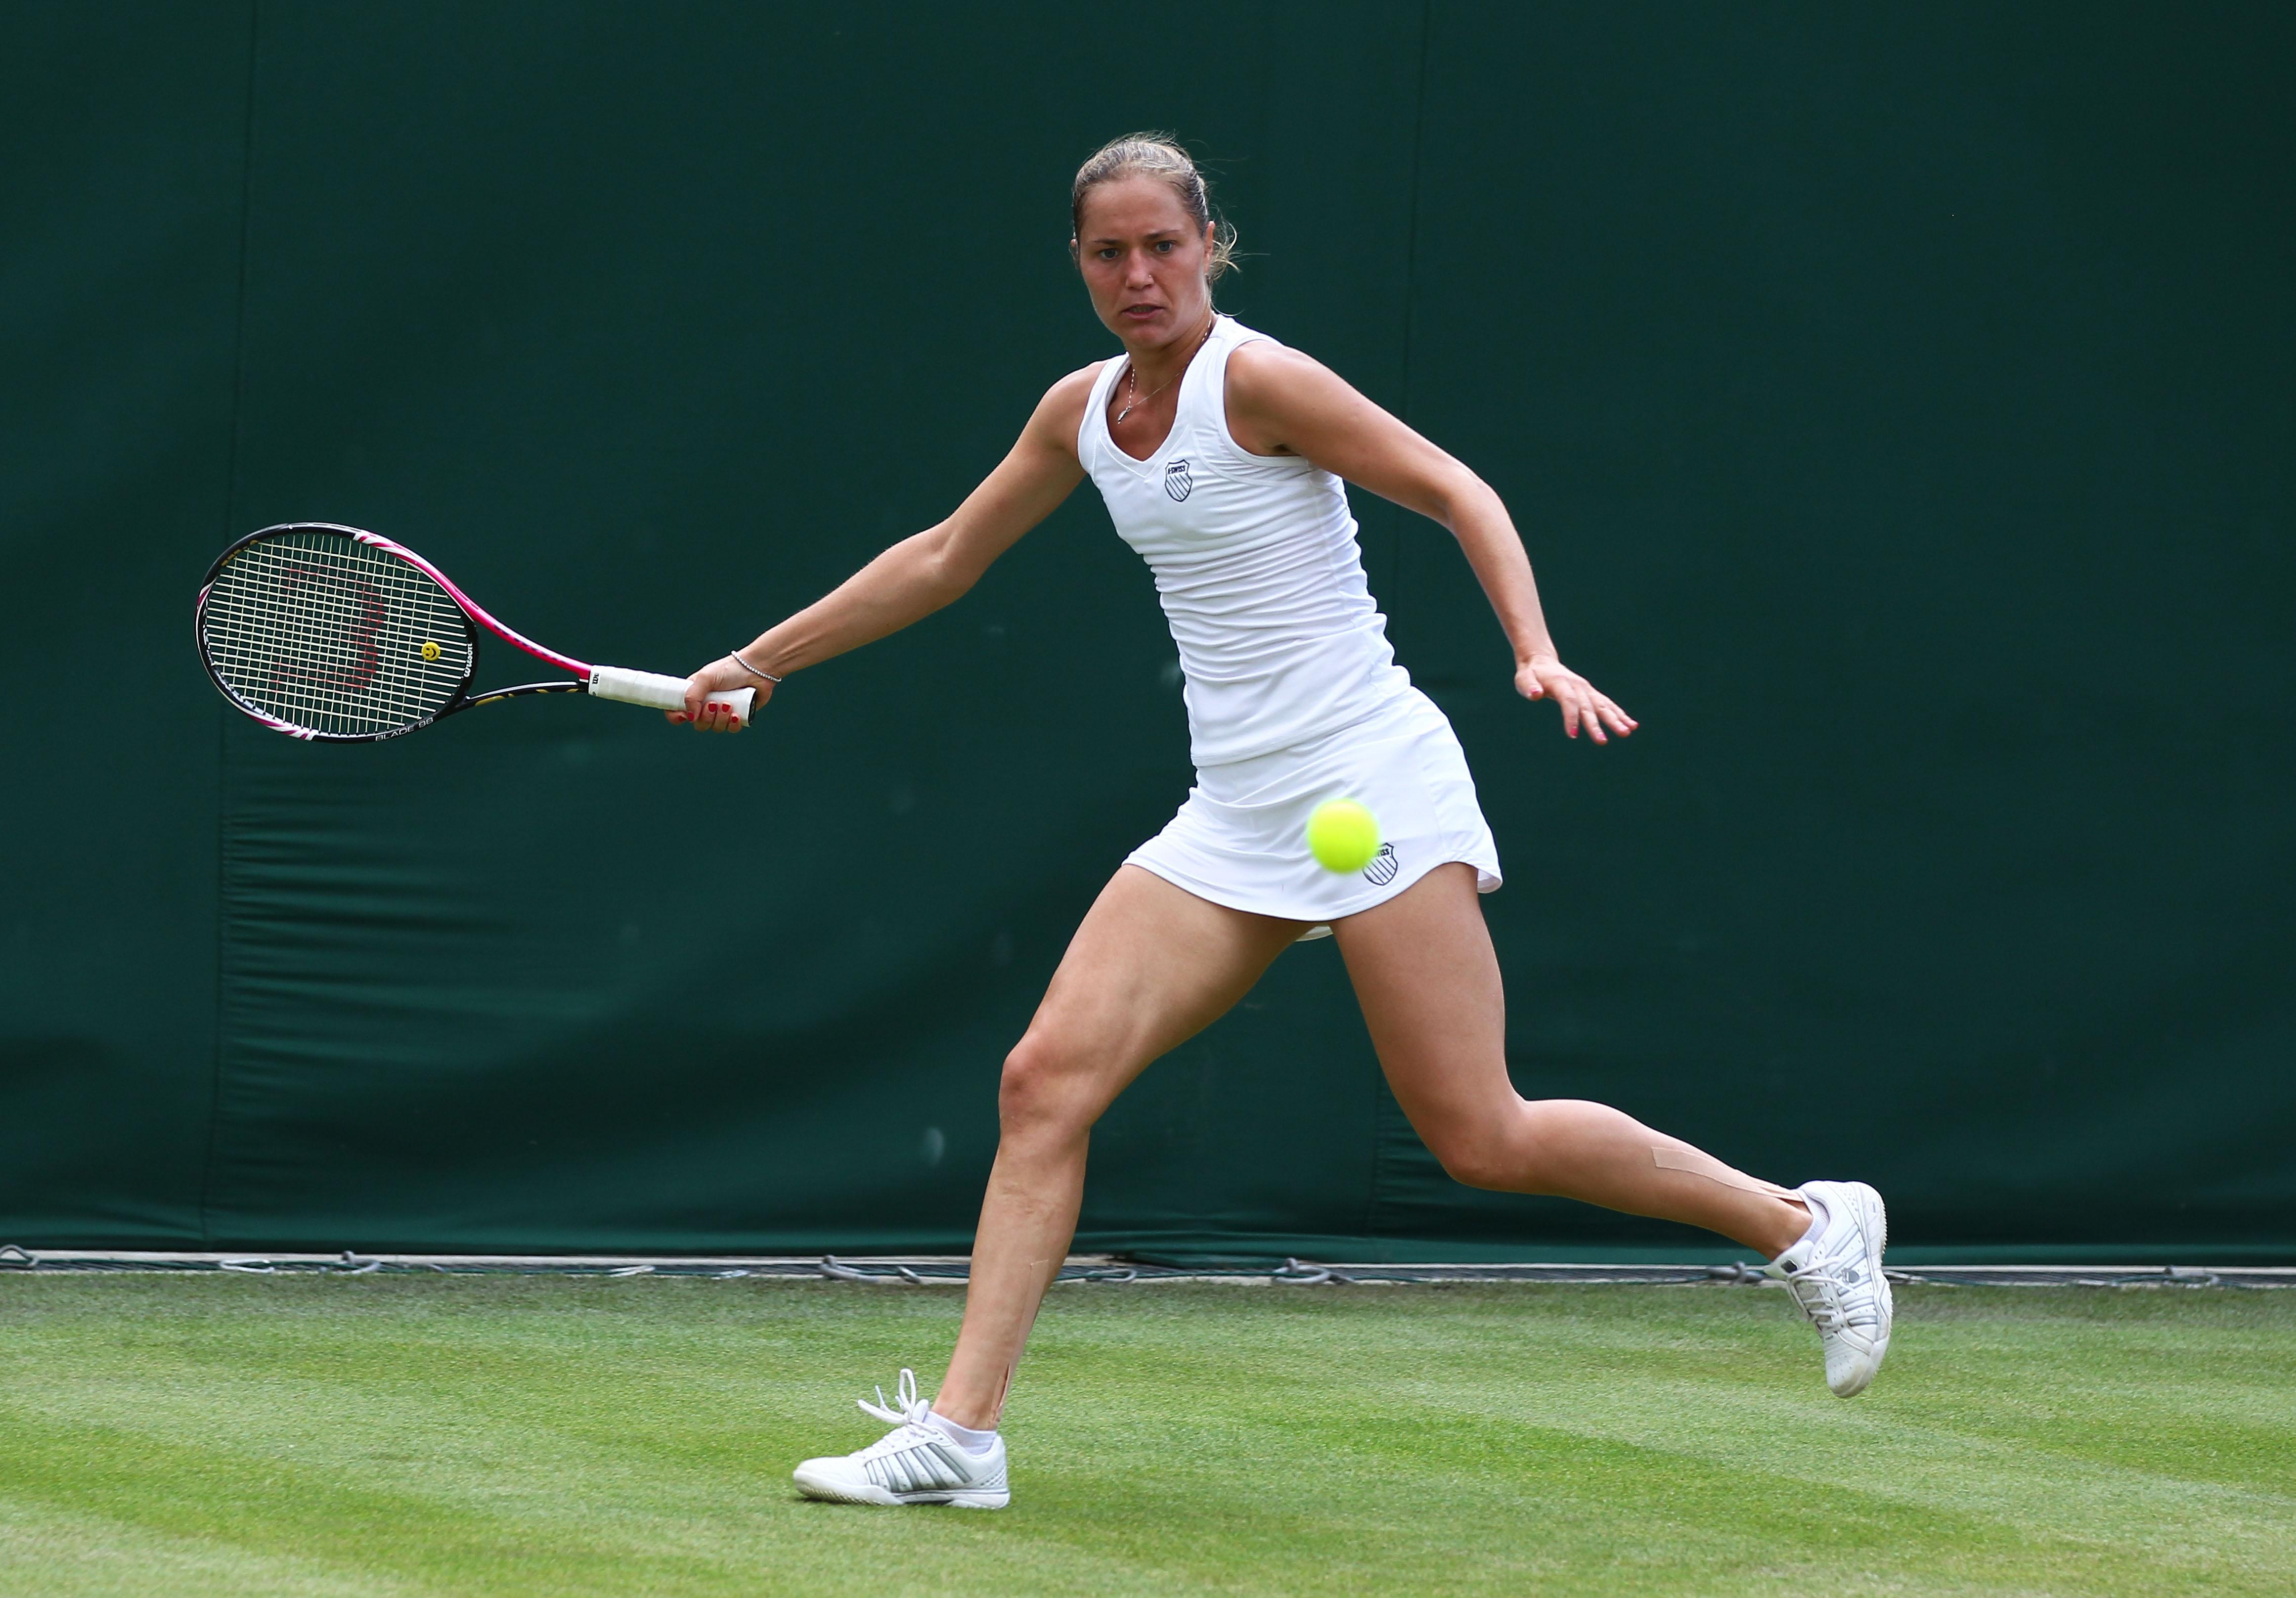 бондаренко катерина теннис